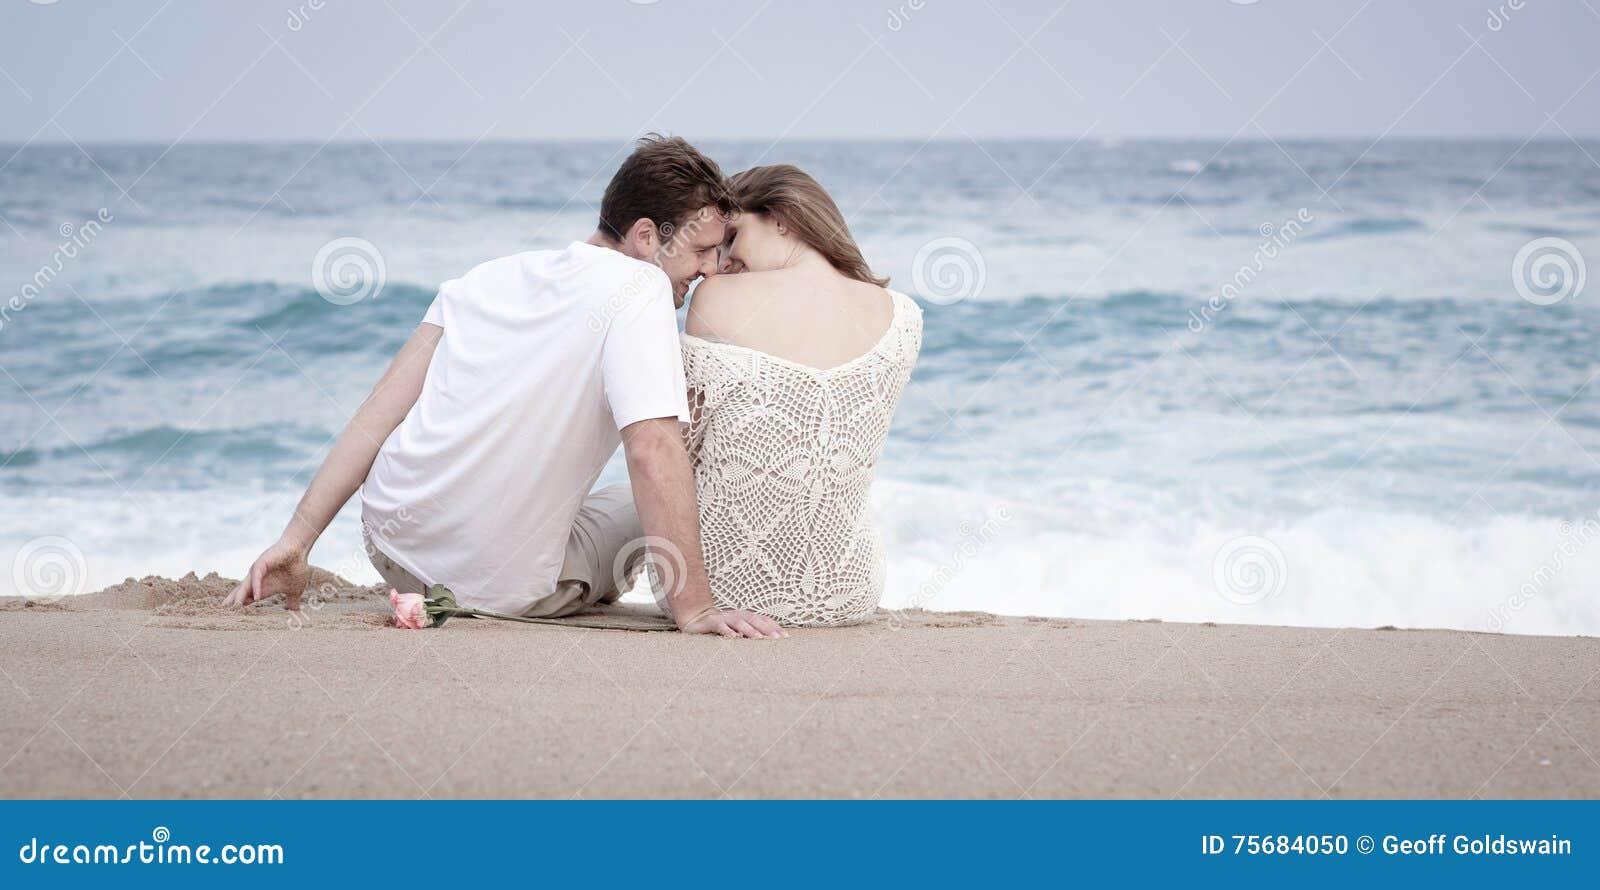 Romance Engagement Couple Love Beach Ocean Lovers Relationship